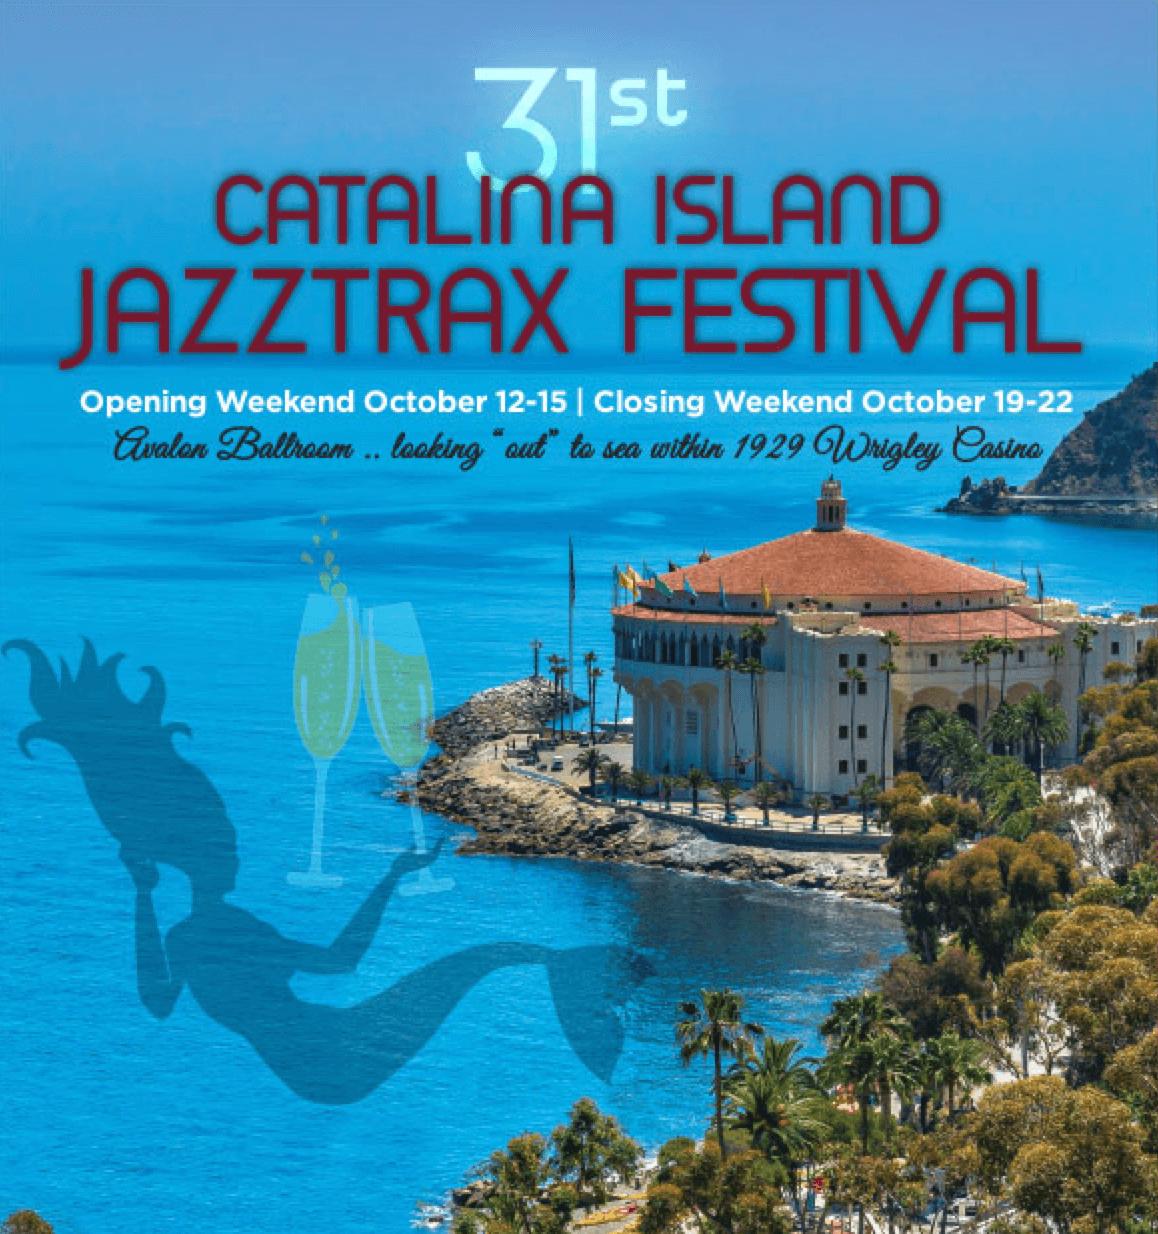 Catalina Island JazzTrax Festival 2017